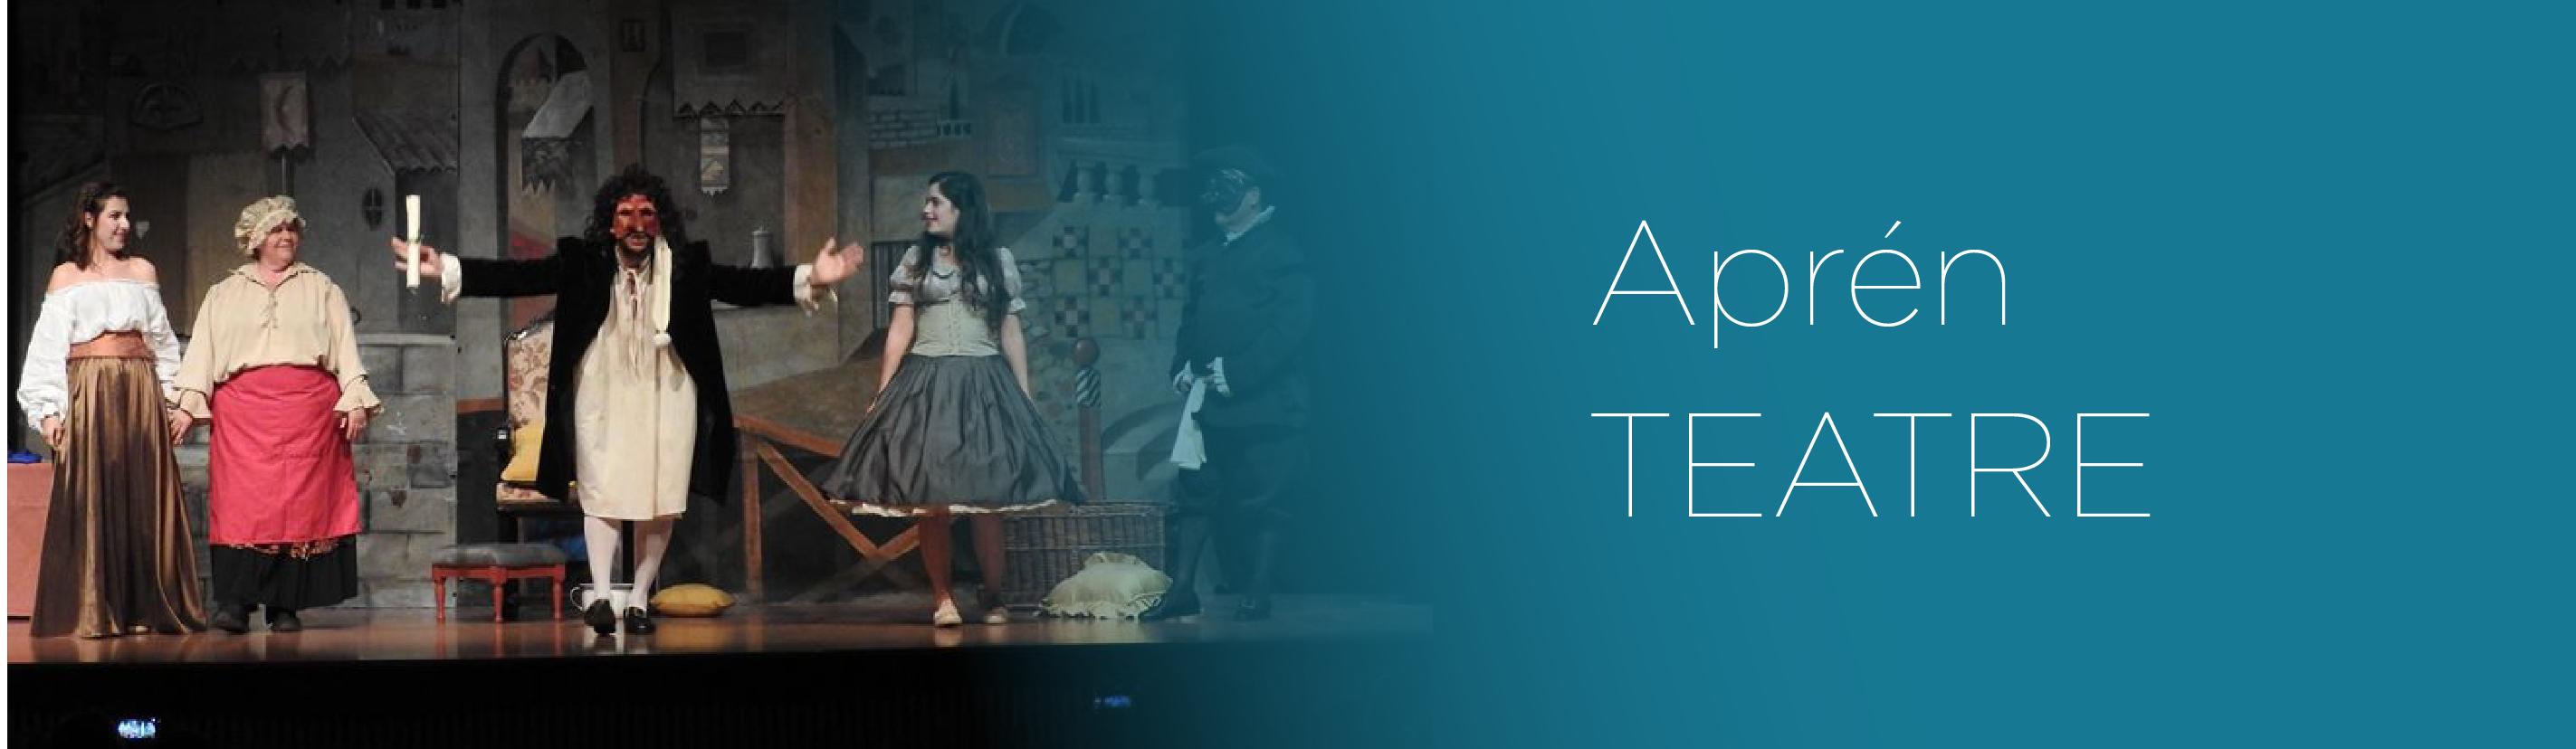 Unió Musical Milamarina - Teatre